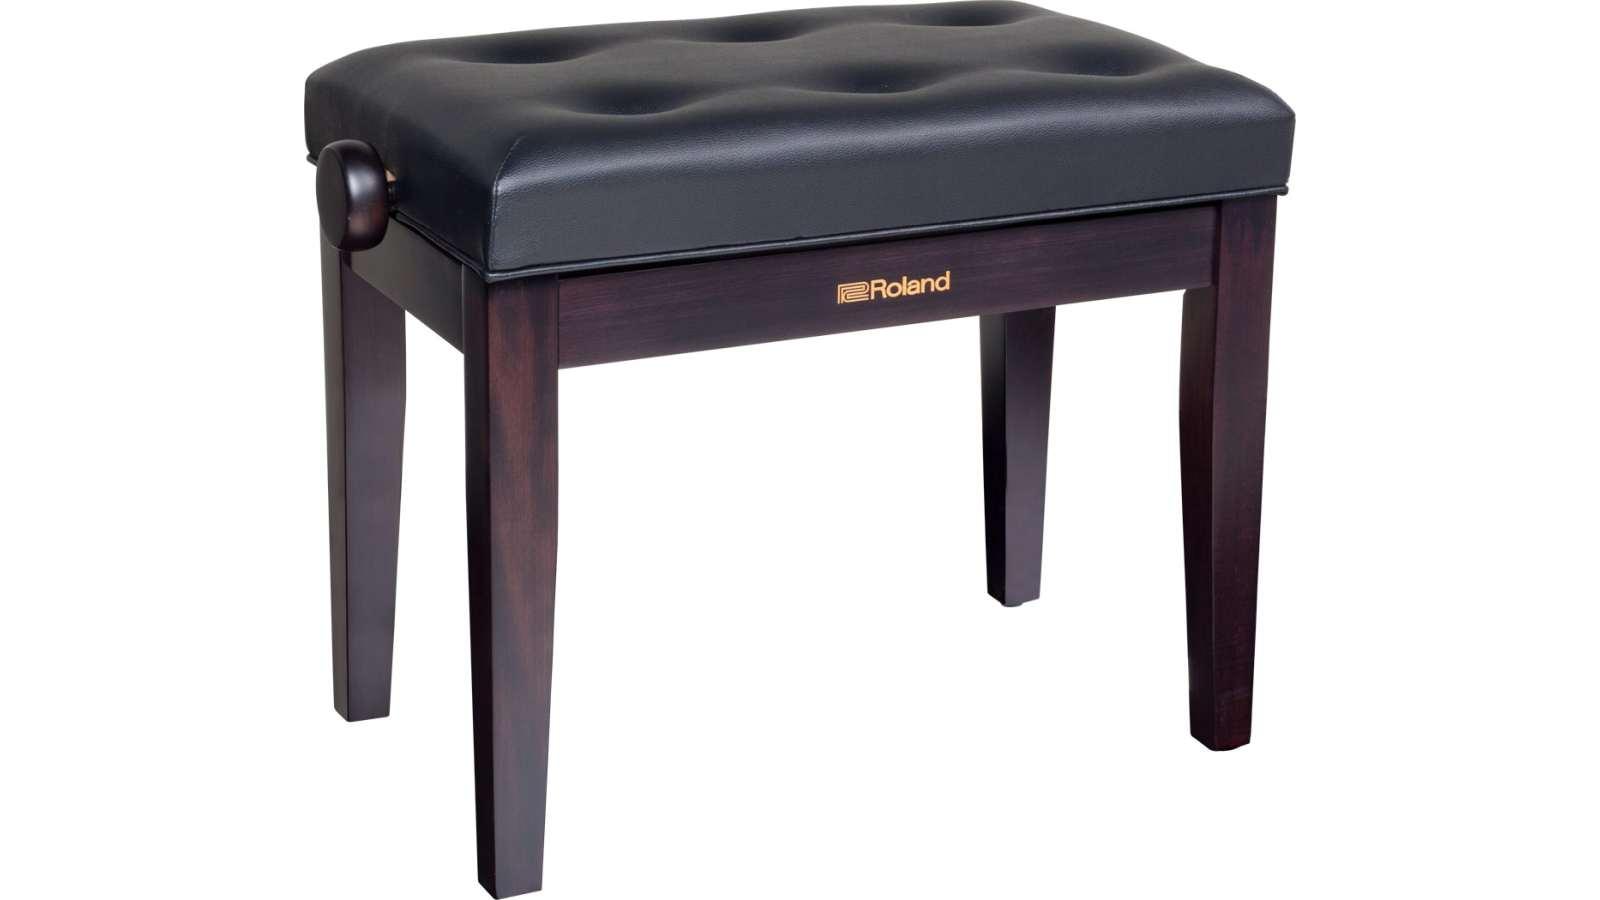 Roland RPB-300 RW Pianobank